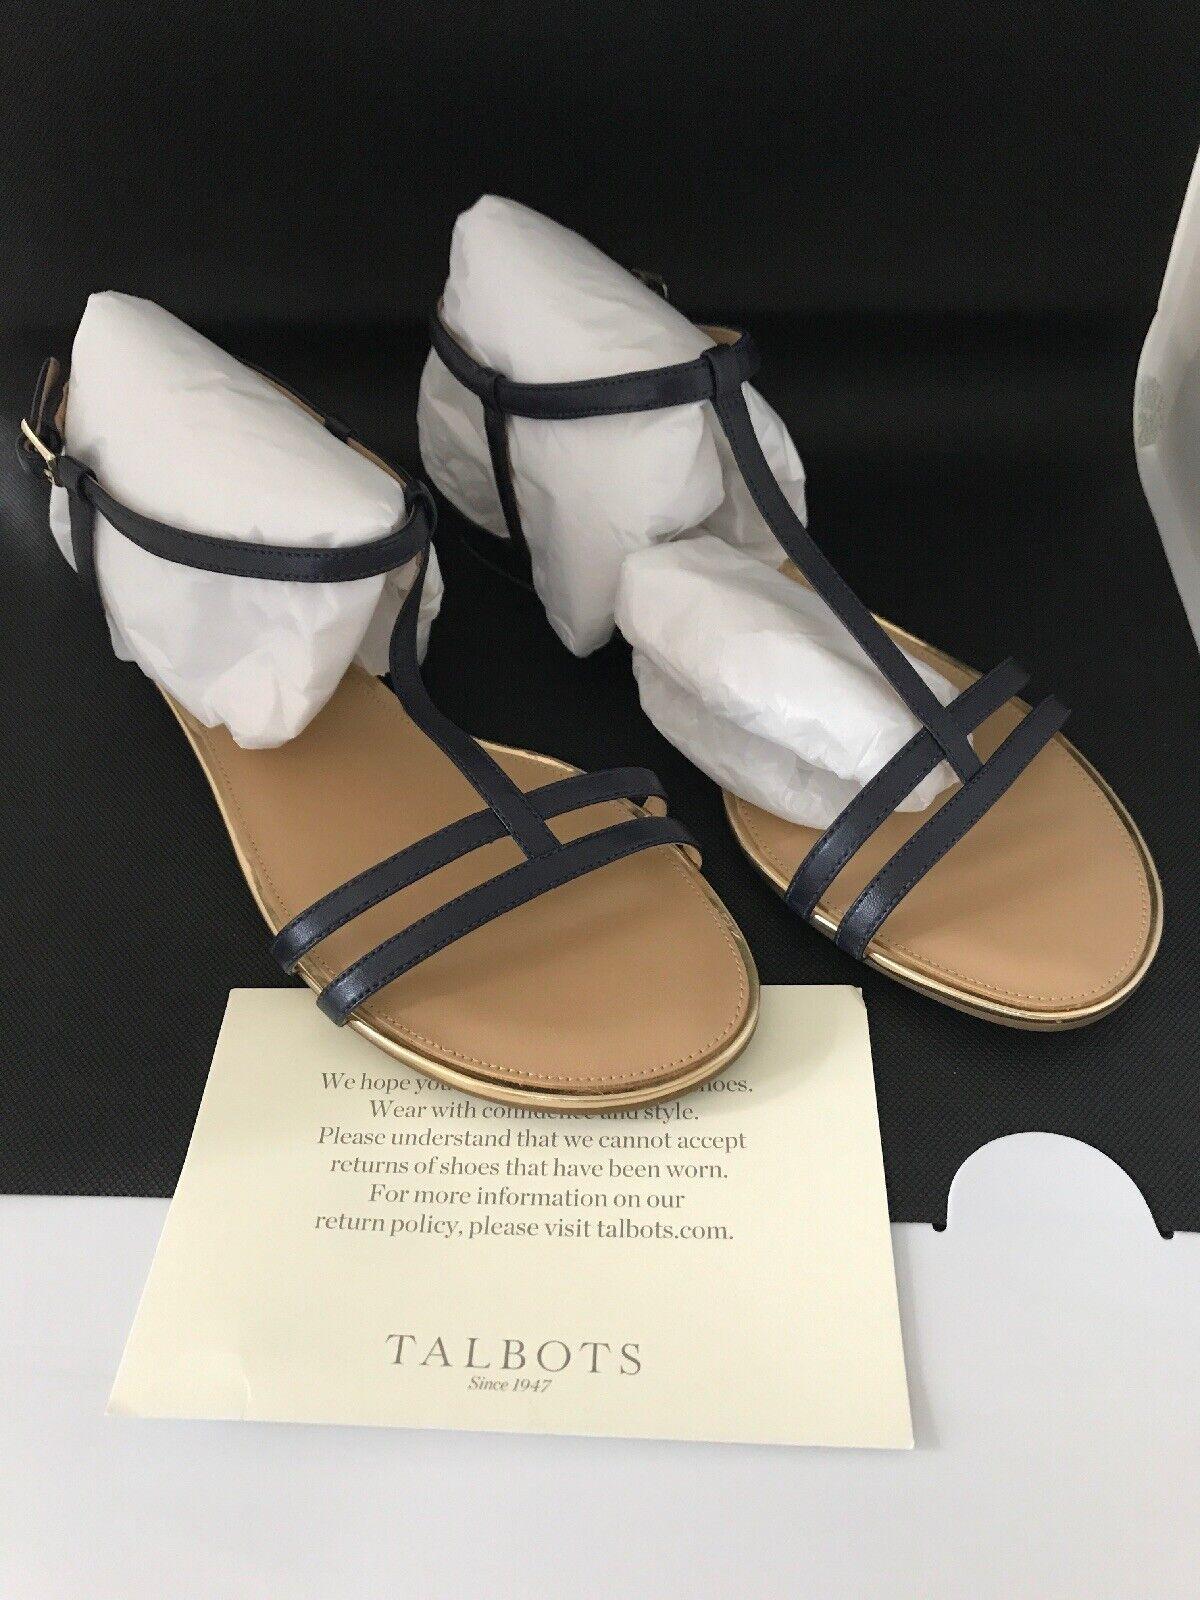 TALBOTS DAISY GLADIATOR MICRO-WEDGE SANDALS -LEATHER, INDIGO blueeE SIZE-10